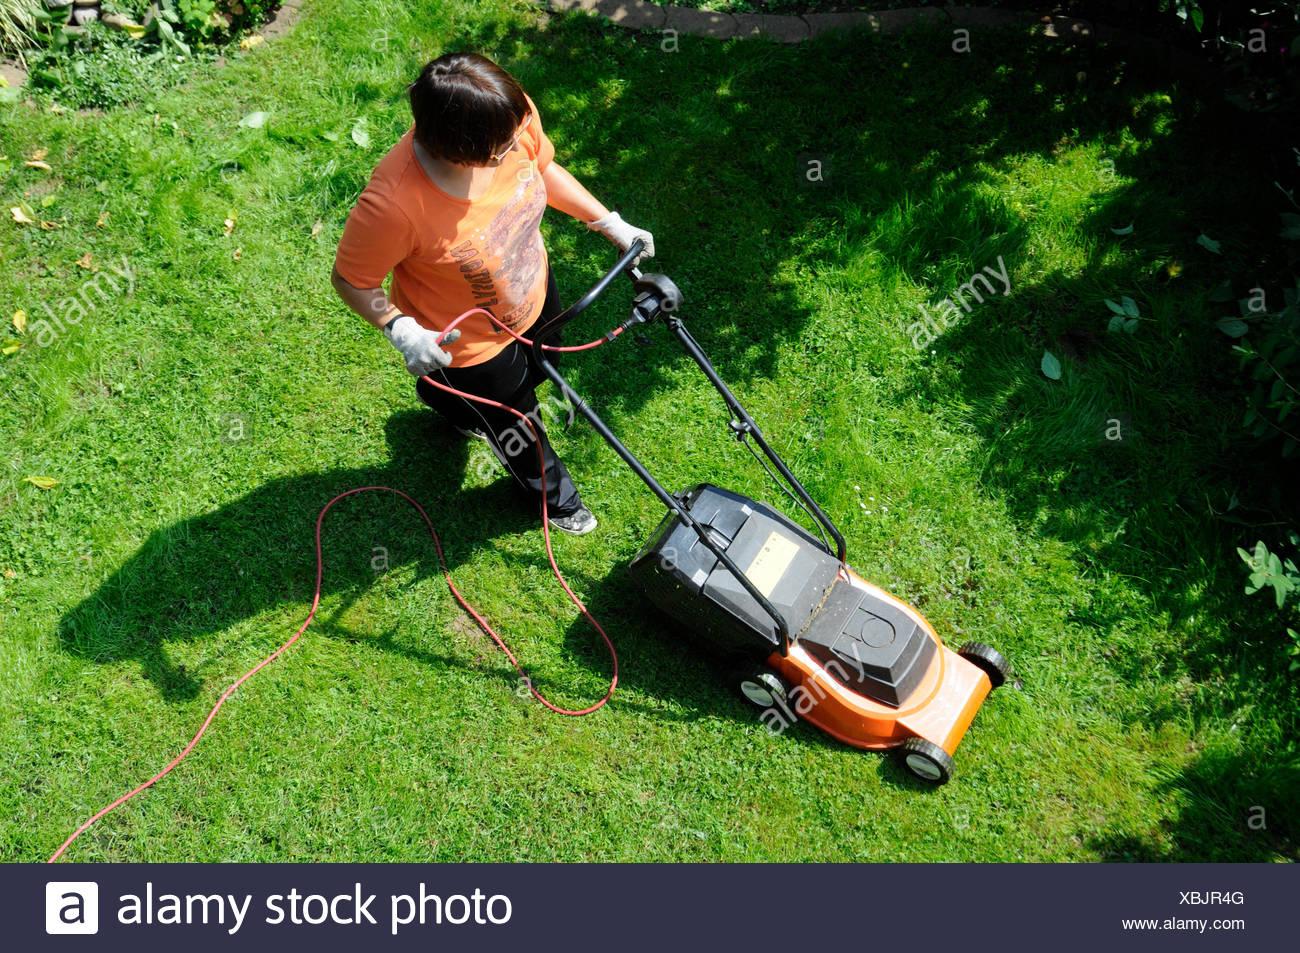 Rasen Mahen Rasen Mahen Rasenmahen Rasen Mahen Rasenmaher Gras